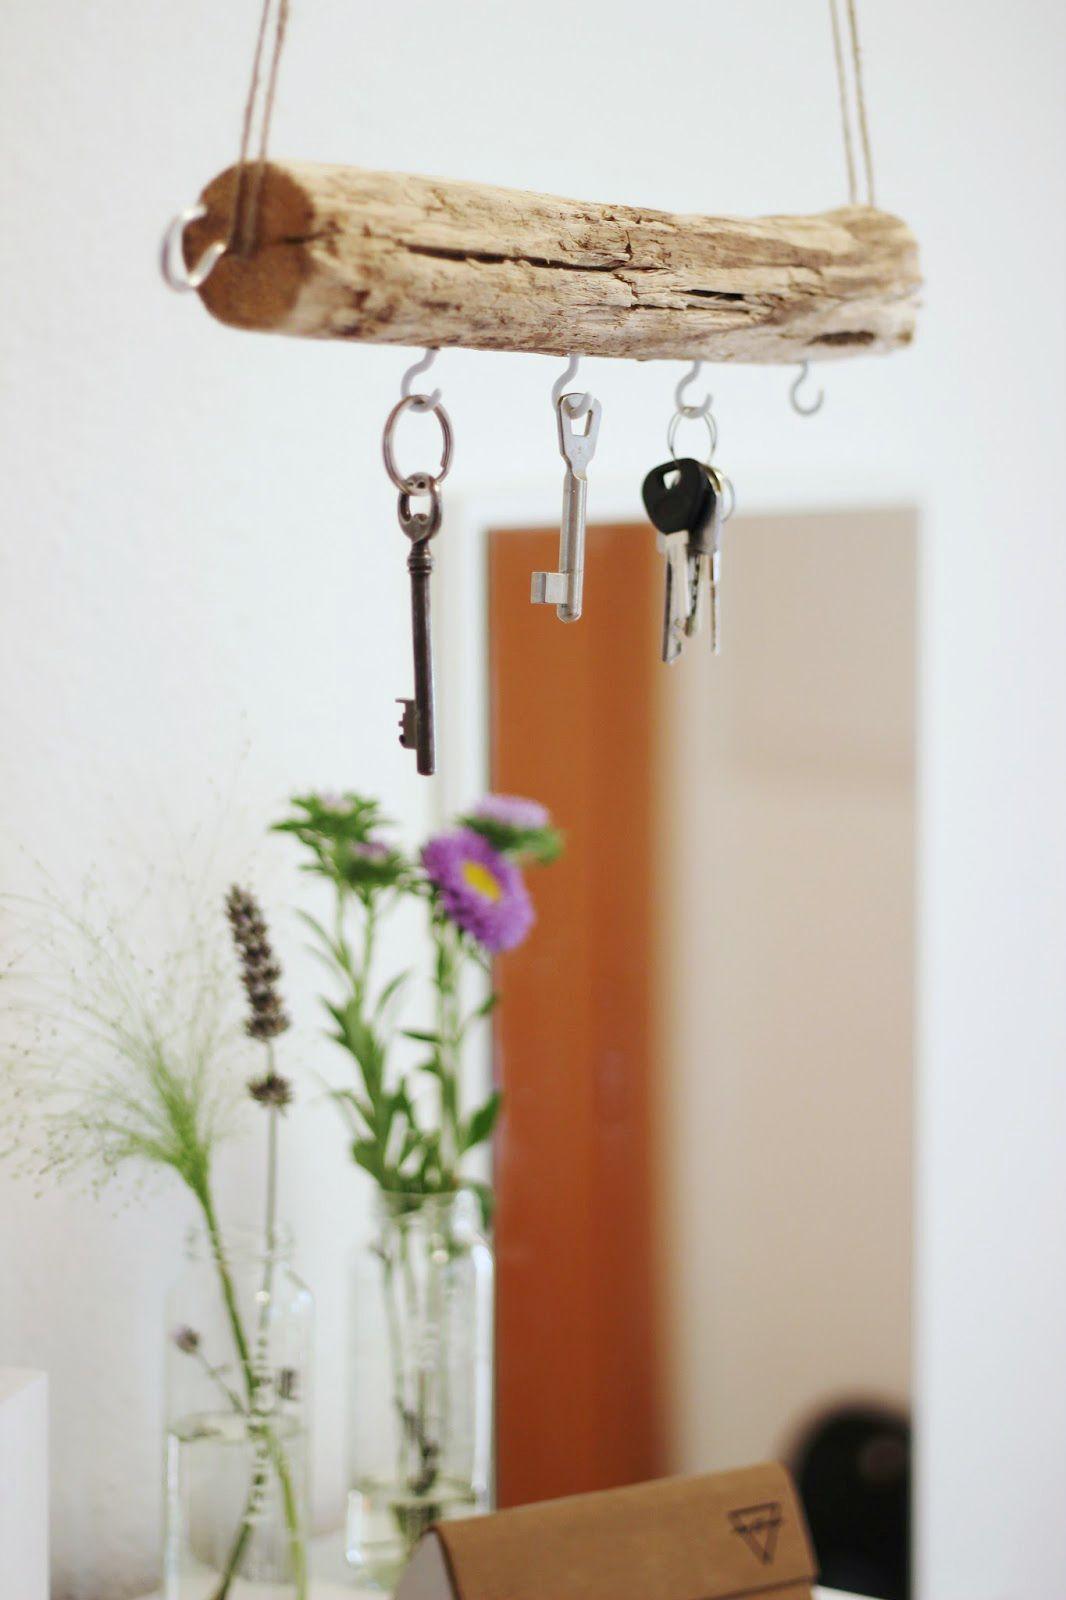 diy: schlüsselbrett aus treibholz selber machen   deco fait maison